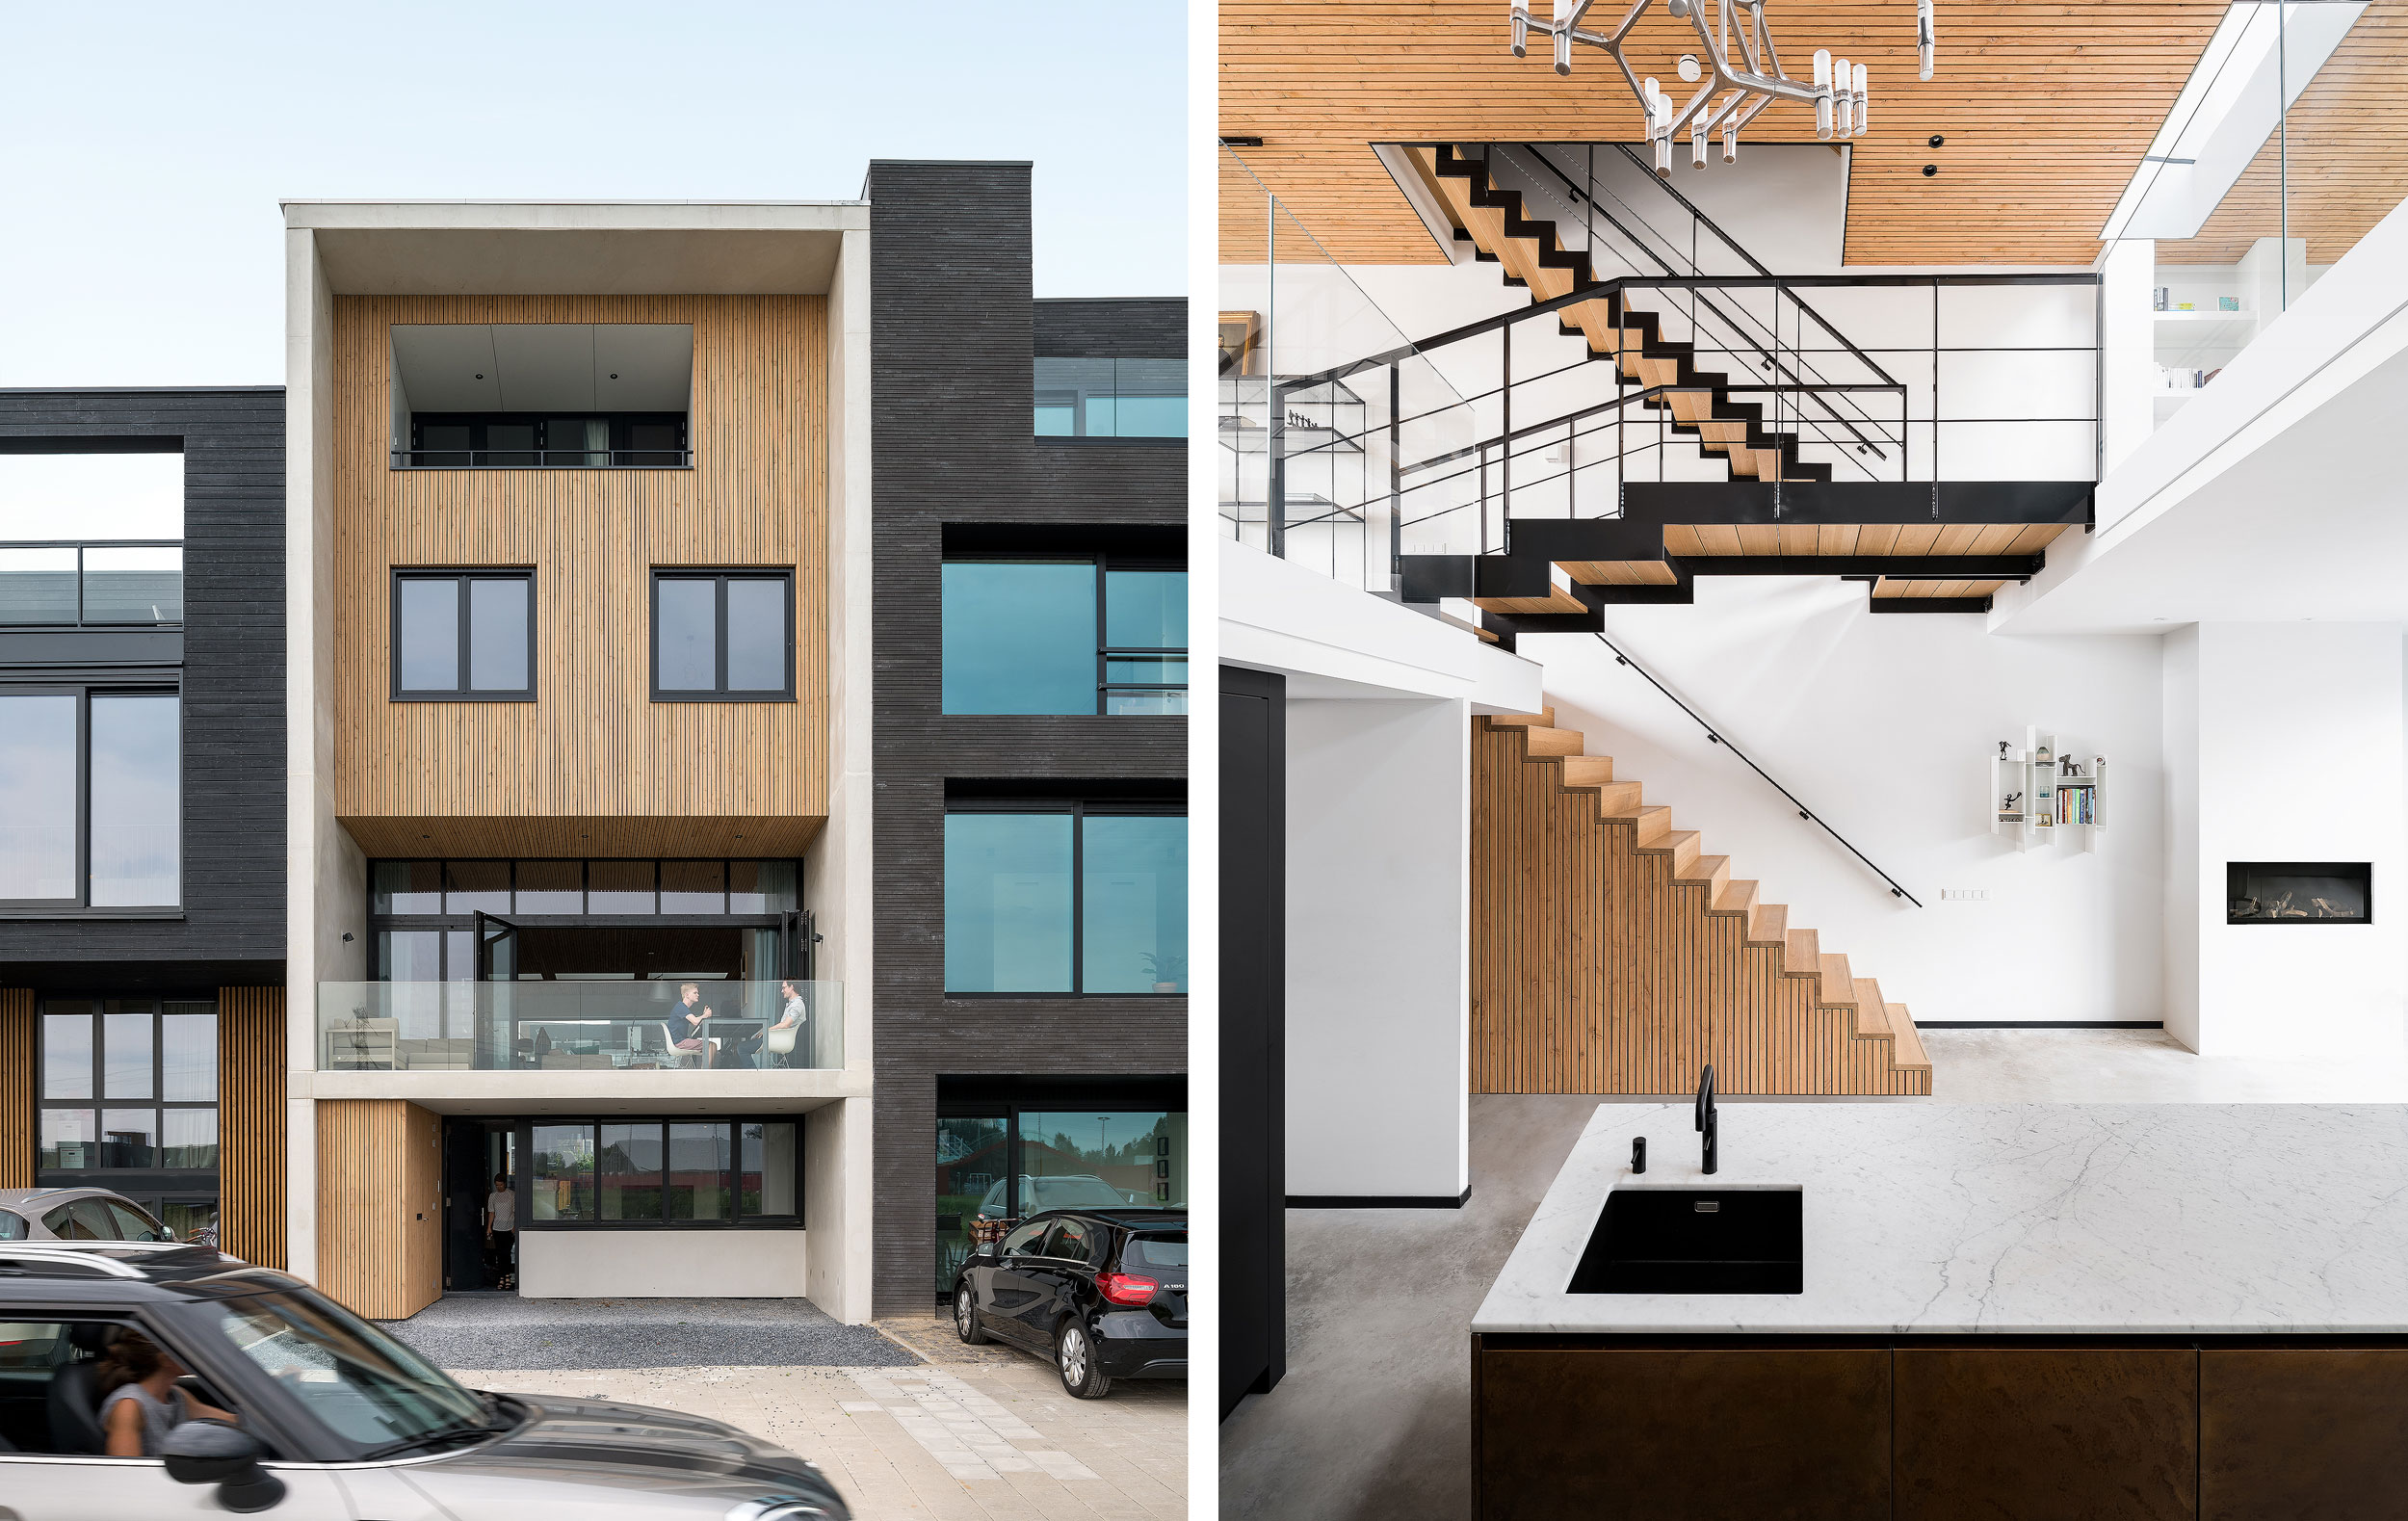 Woning Amsterdam - fotografie architectuur door Chiel de Nooyer, architectuurfotograaf